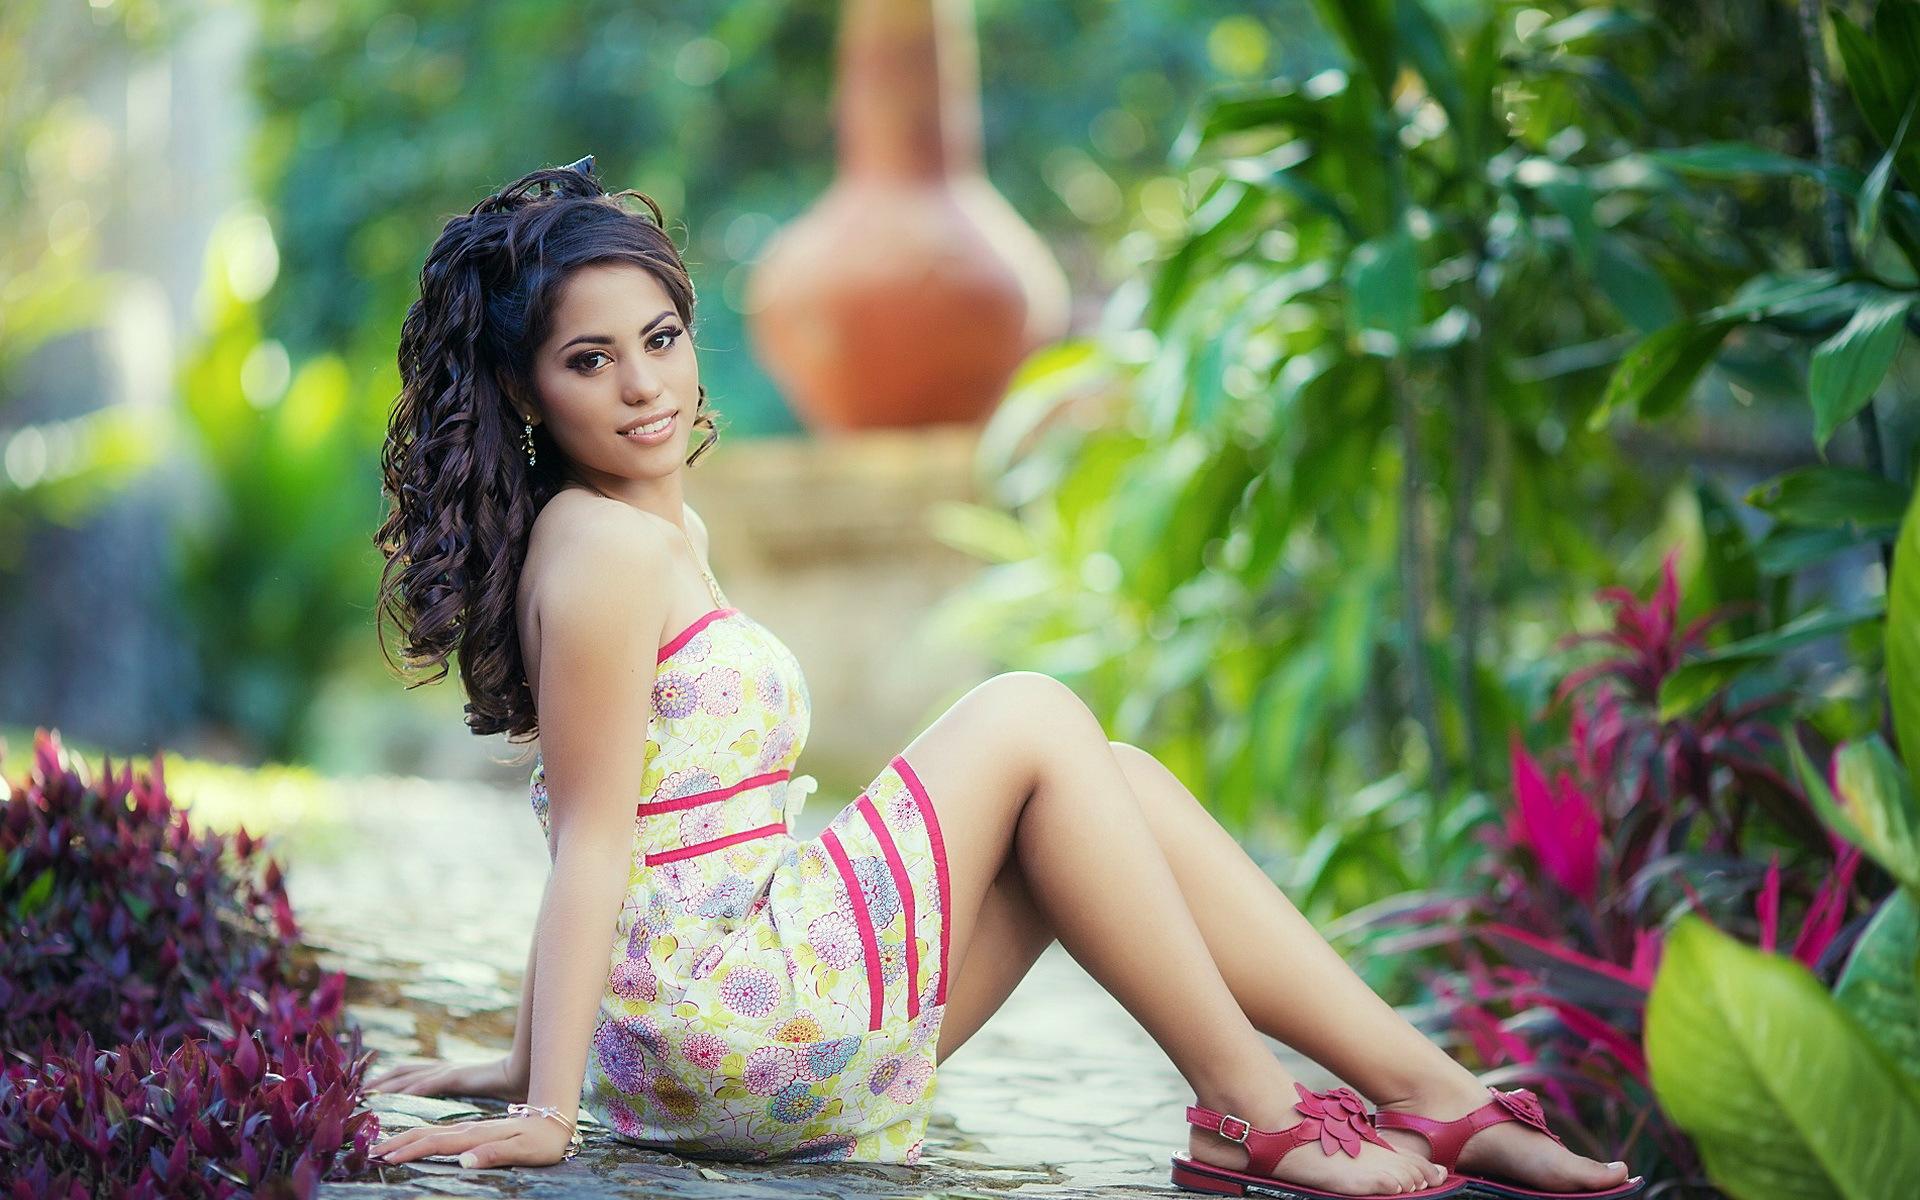 Latina girls wallpapers